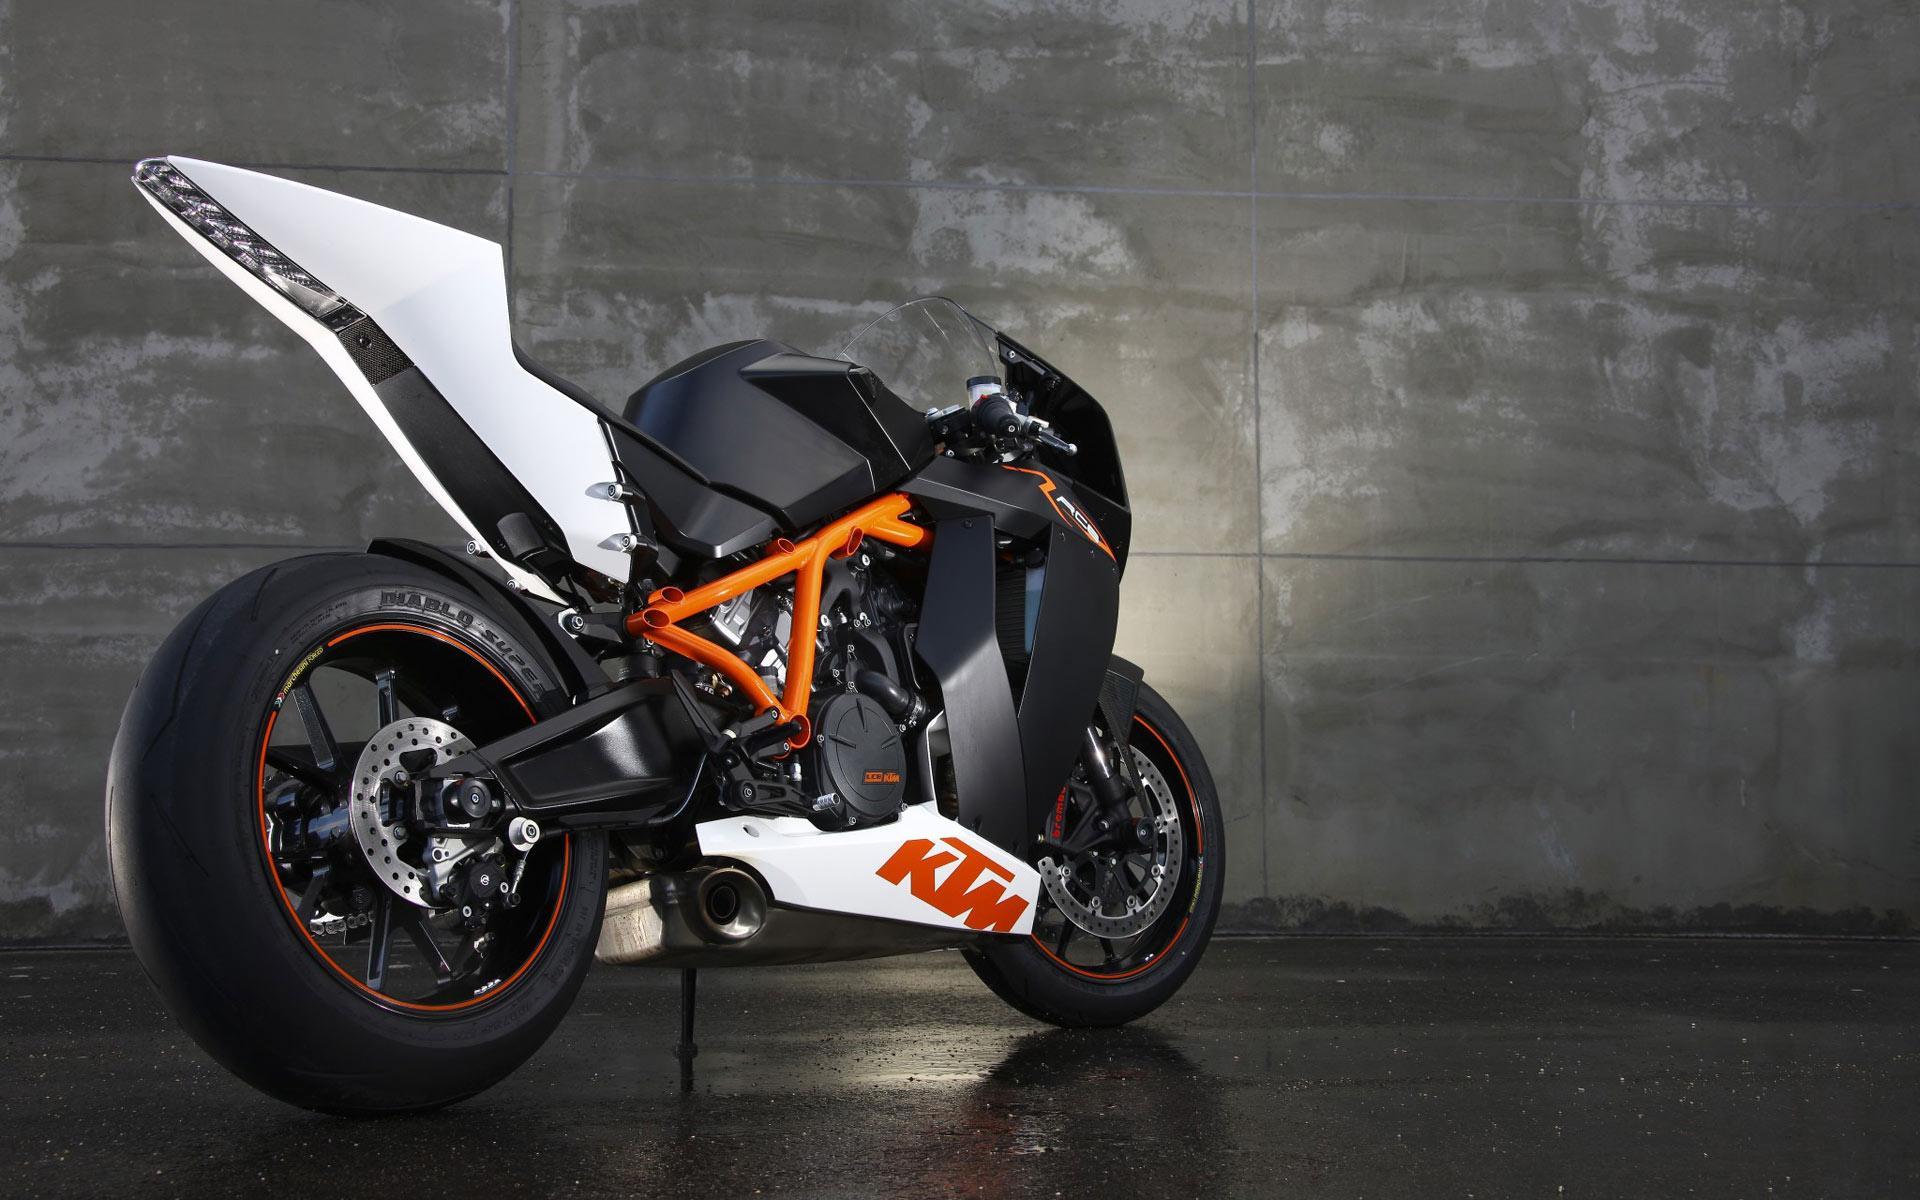 мотоциклы спортивный спорт  № 1566617 без смс